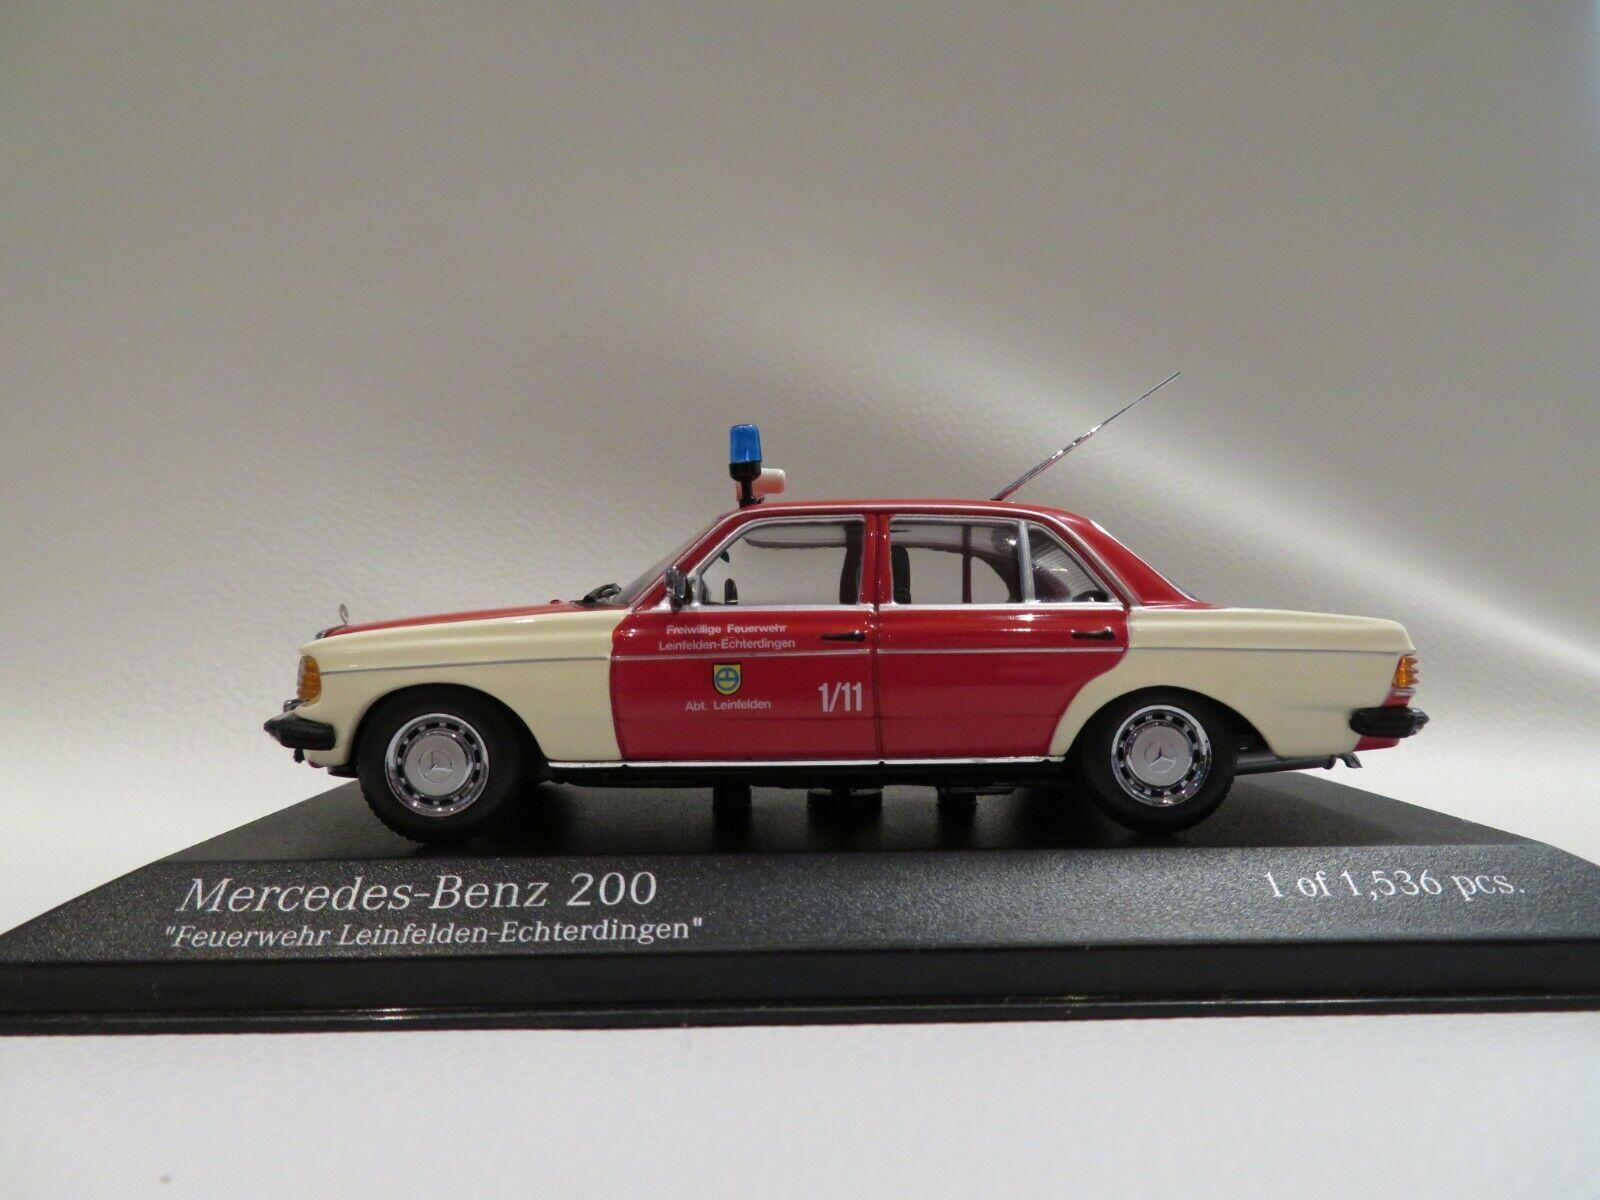 1 43 Minichamps Mercedes Benz 200 Feuerwehr Leinfelden-Echterdingen Diecast